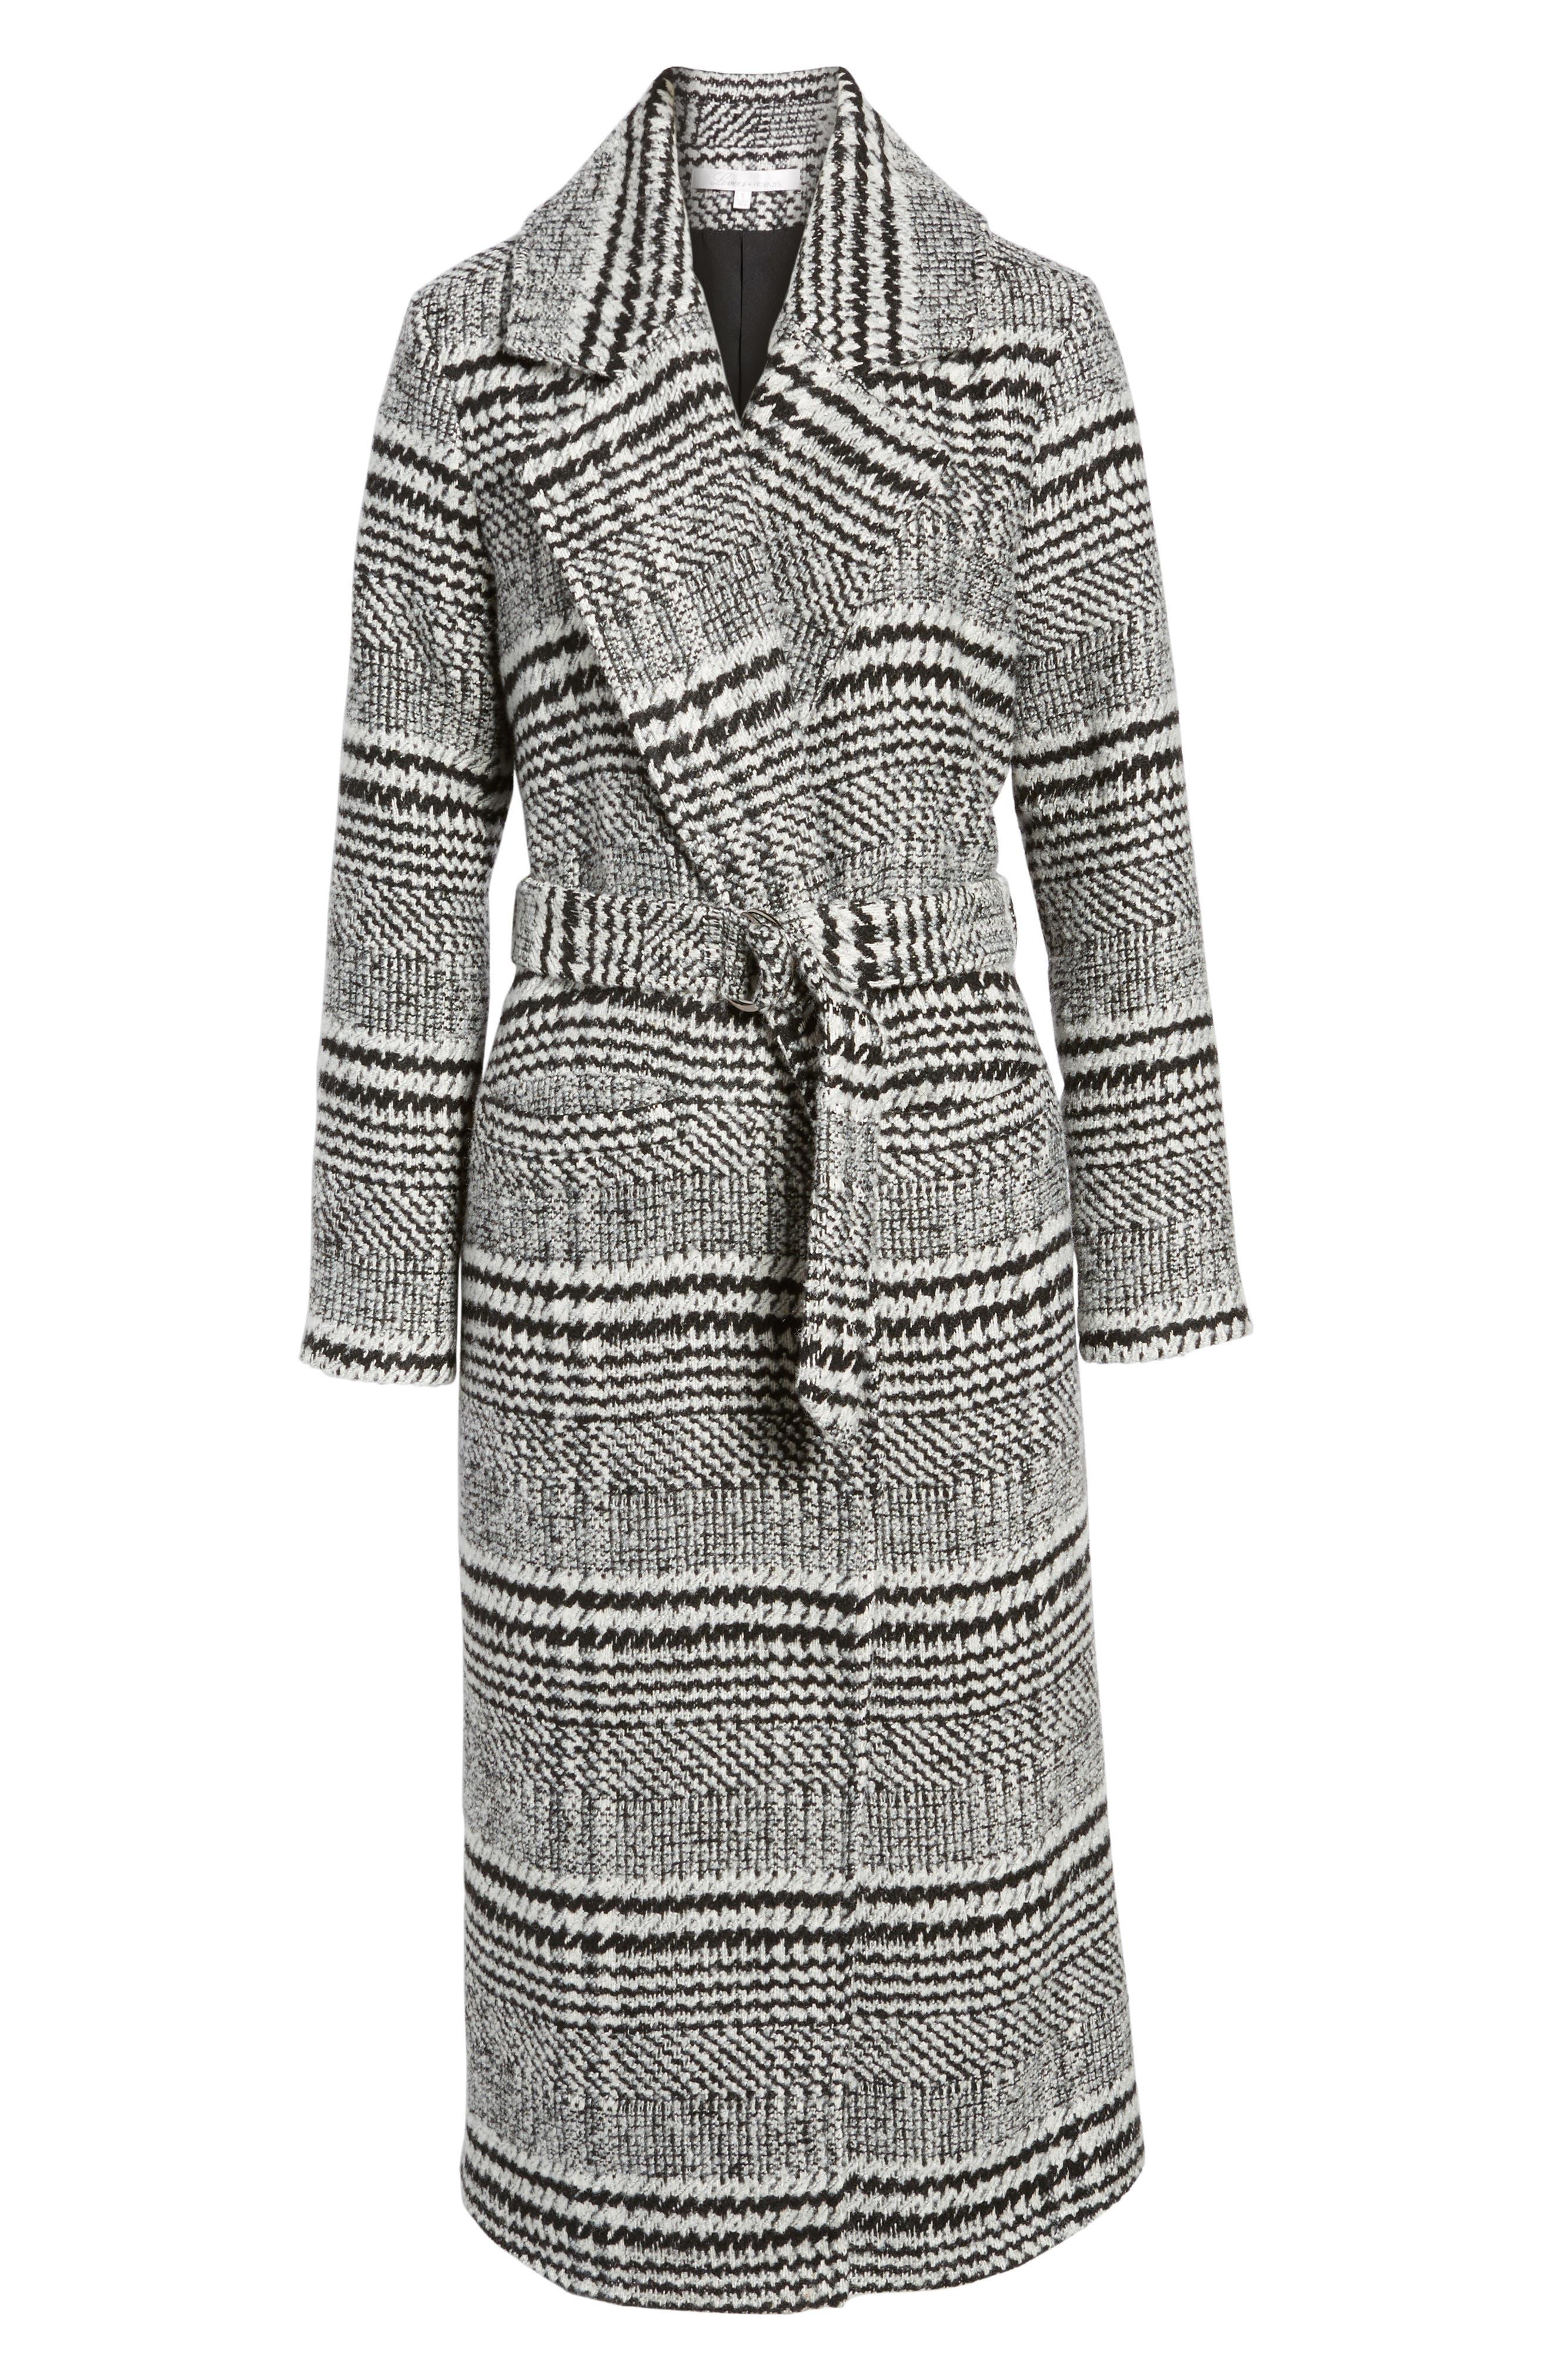 Sabra Longline Plaid Coat,                             Alternate thumbnail 5, color,                             001